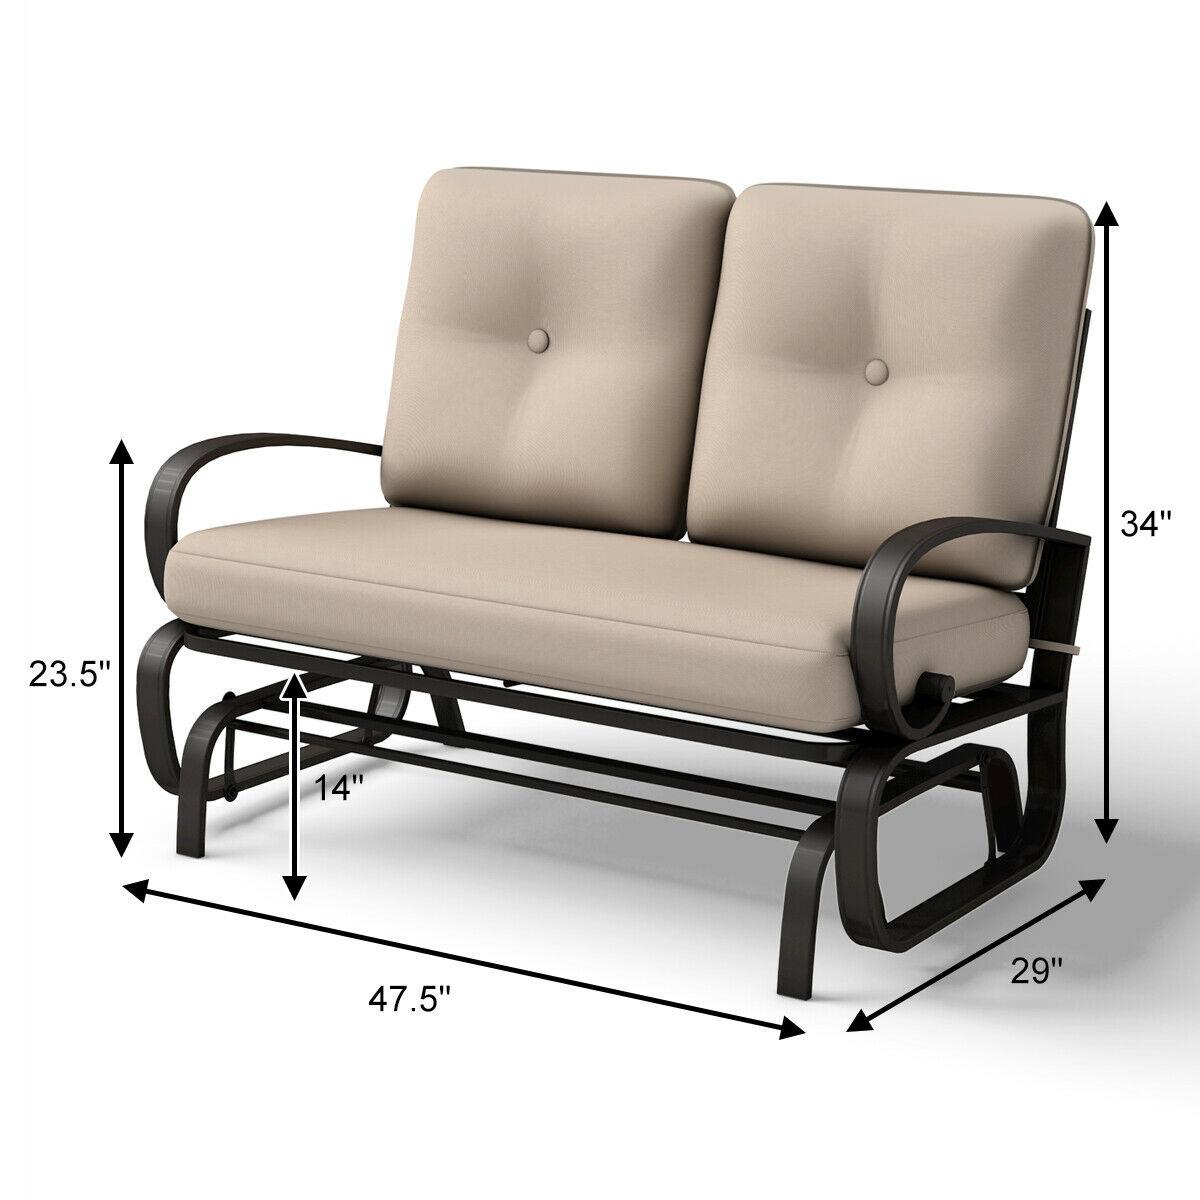 Costway Glider Outdoor Patio Rocking Bench Loveseat With Loveseat Glider Benches With Cushions (View 6 of 25)